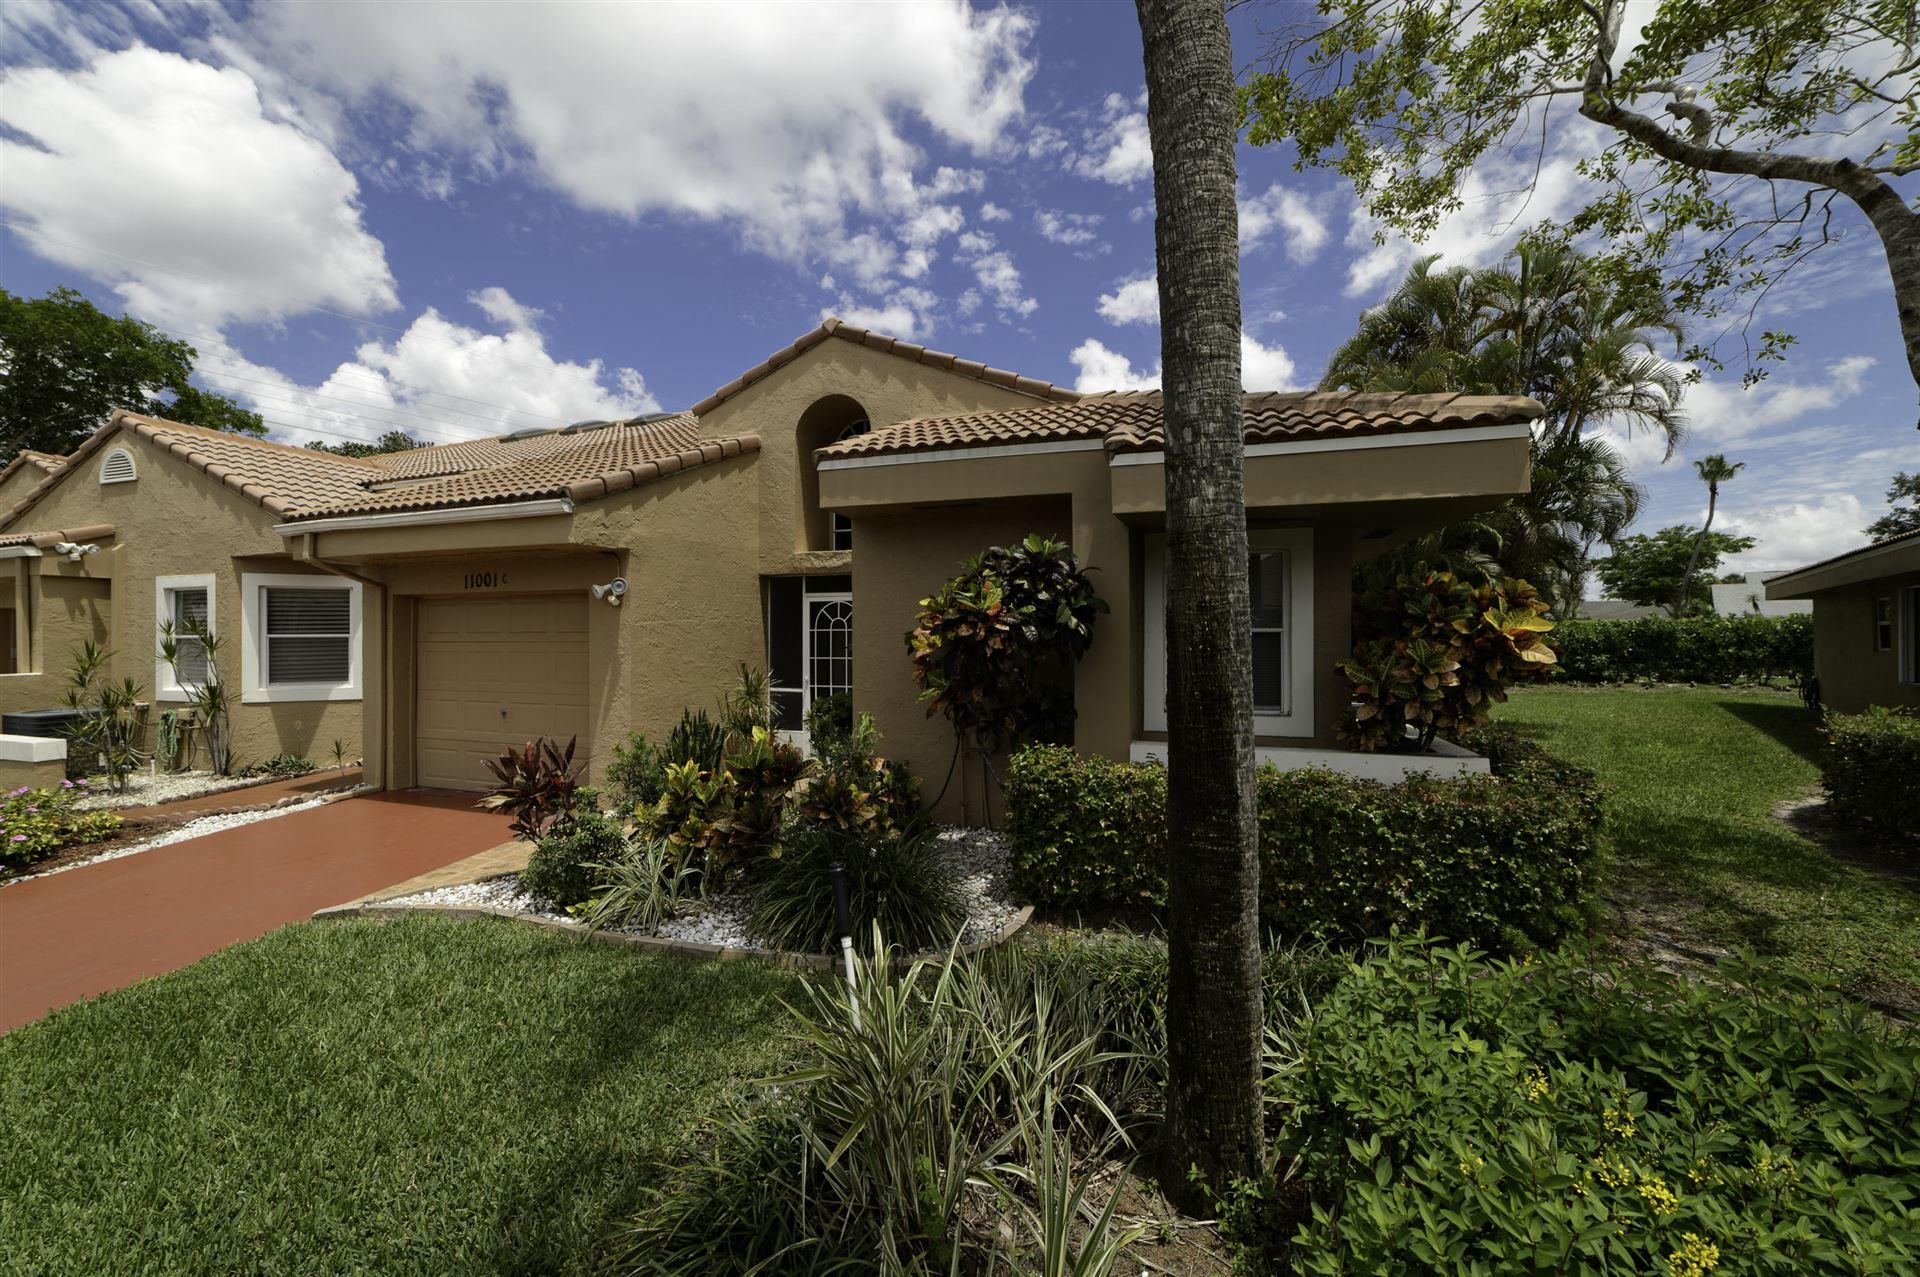 11001 Ladera Lane #C, Boca Raton, FL 33498 - #: RX-10628488